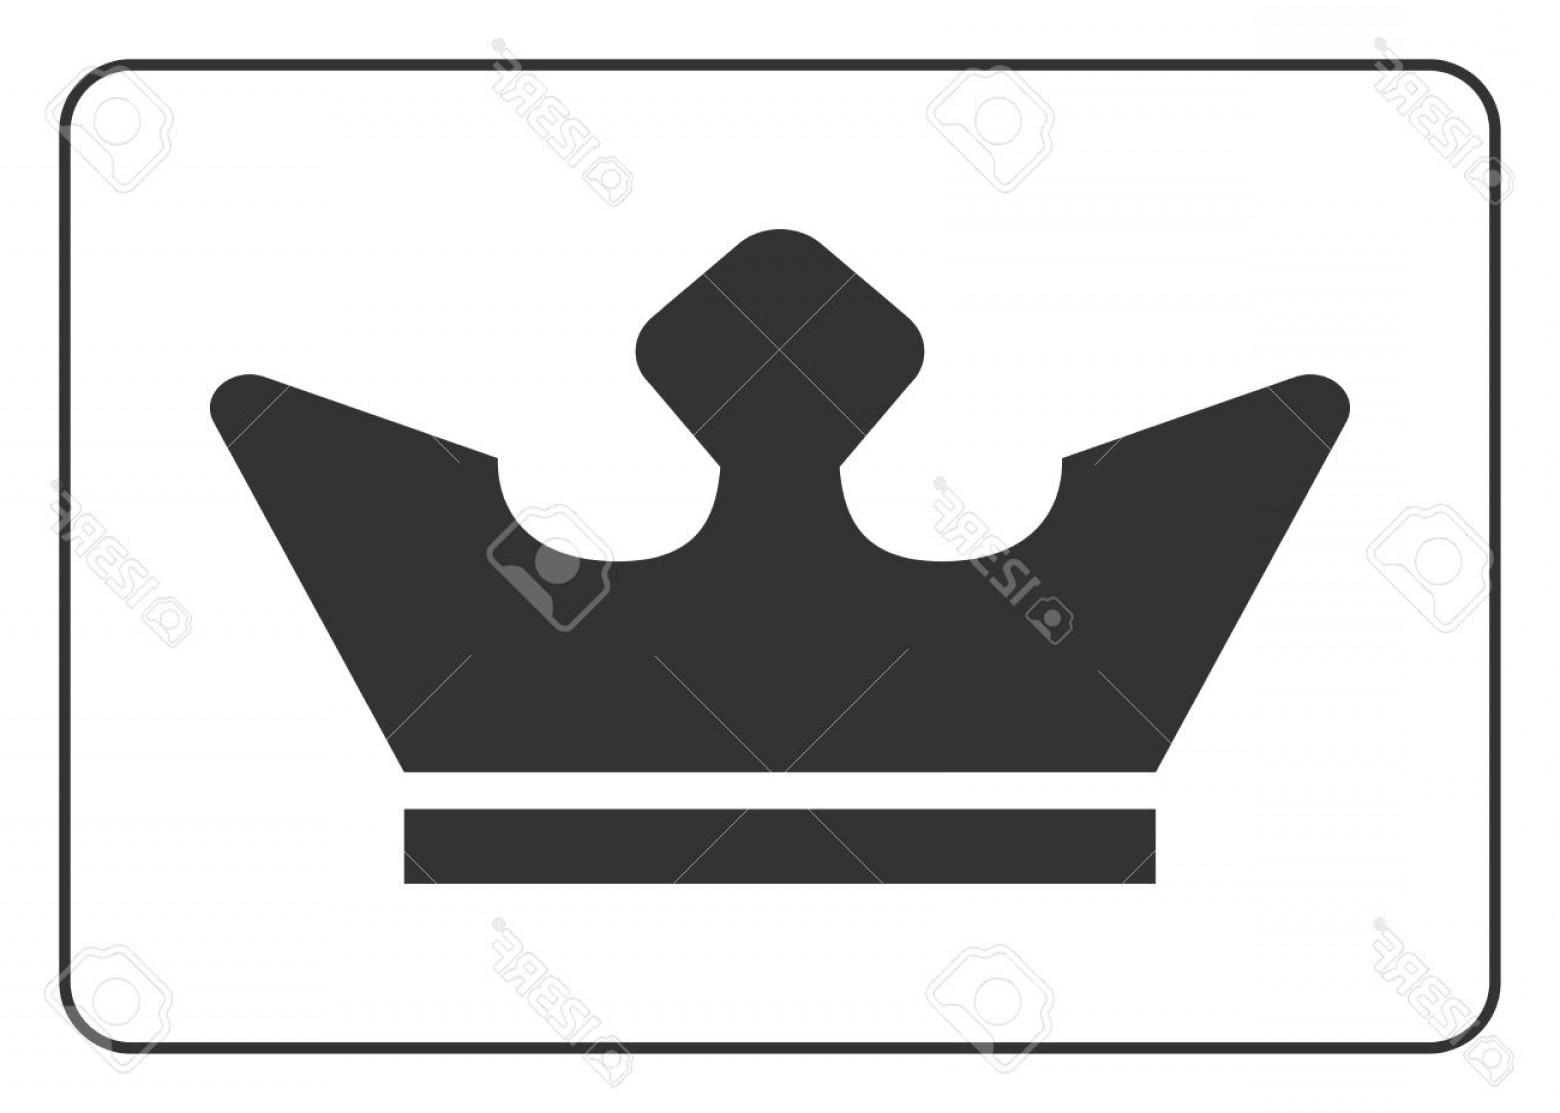 1560x1113 Simple Queen Crown Silhouette Vector Lazttweet